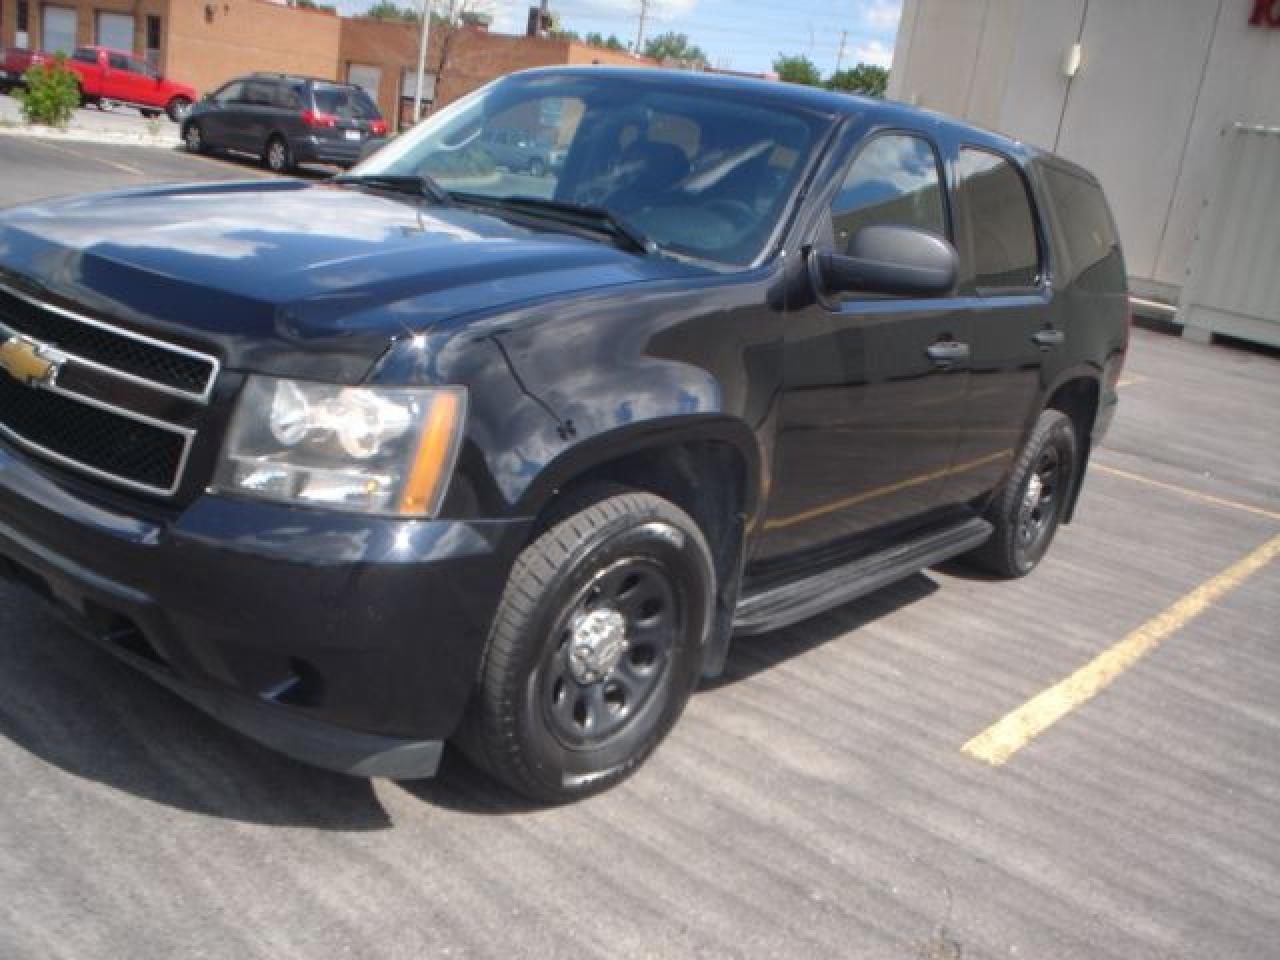 2014 Chevrolet Tahoe ex police blk/blk 6 passenger